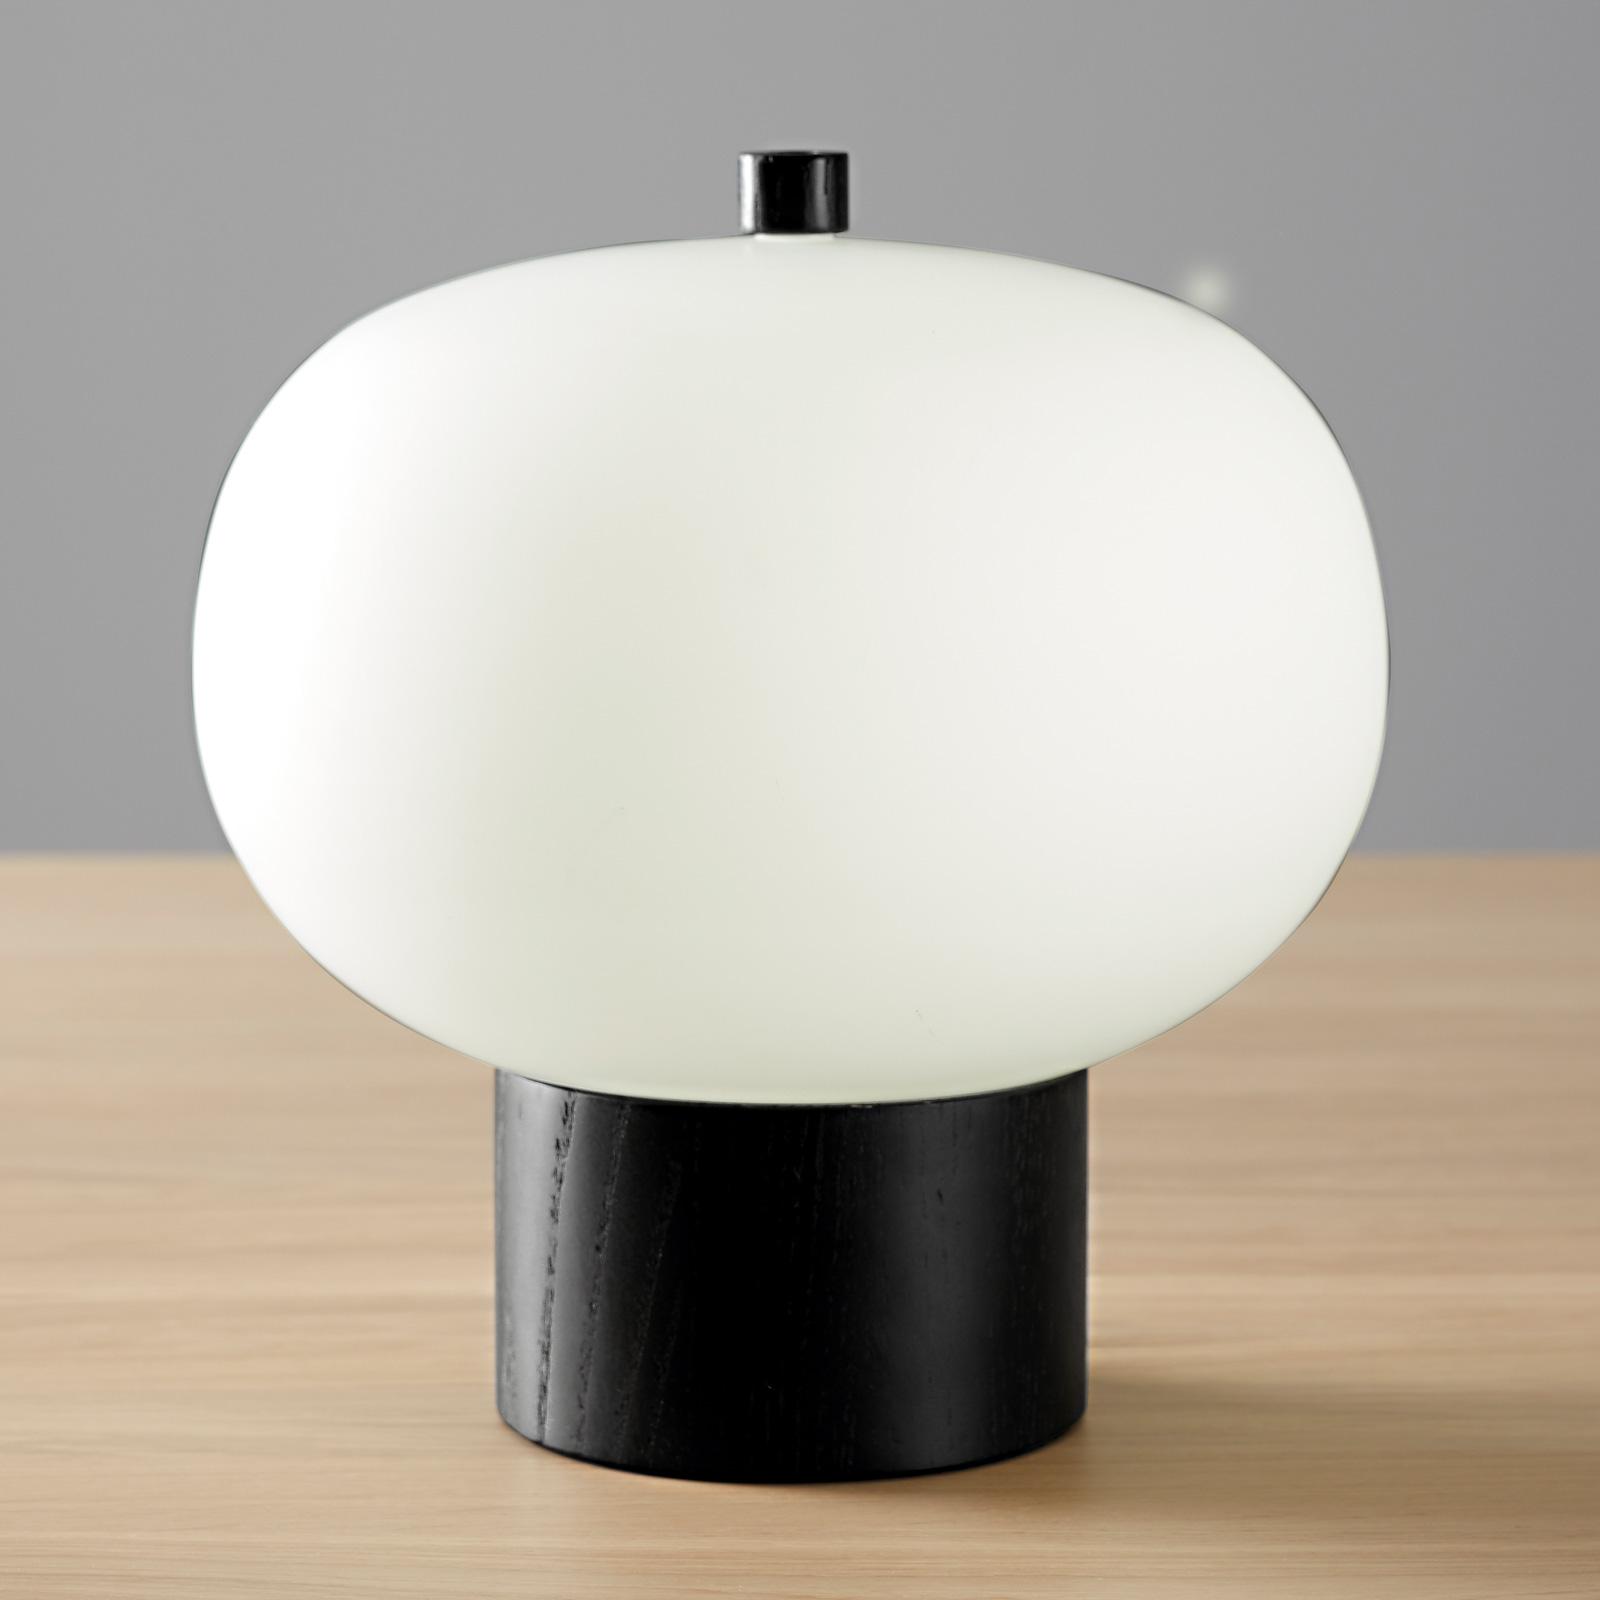 Grok iLargi LED tafellamp, Ø 24 cm, donker essen